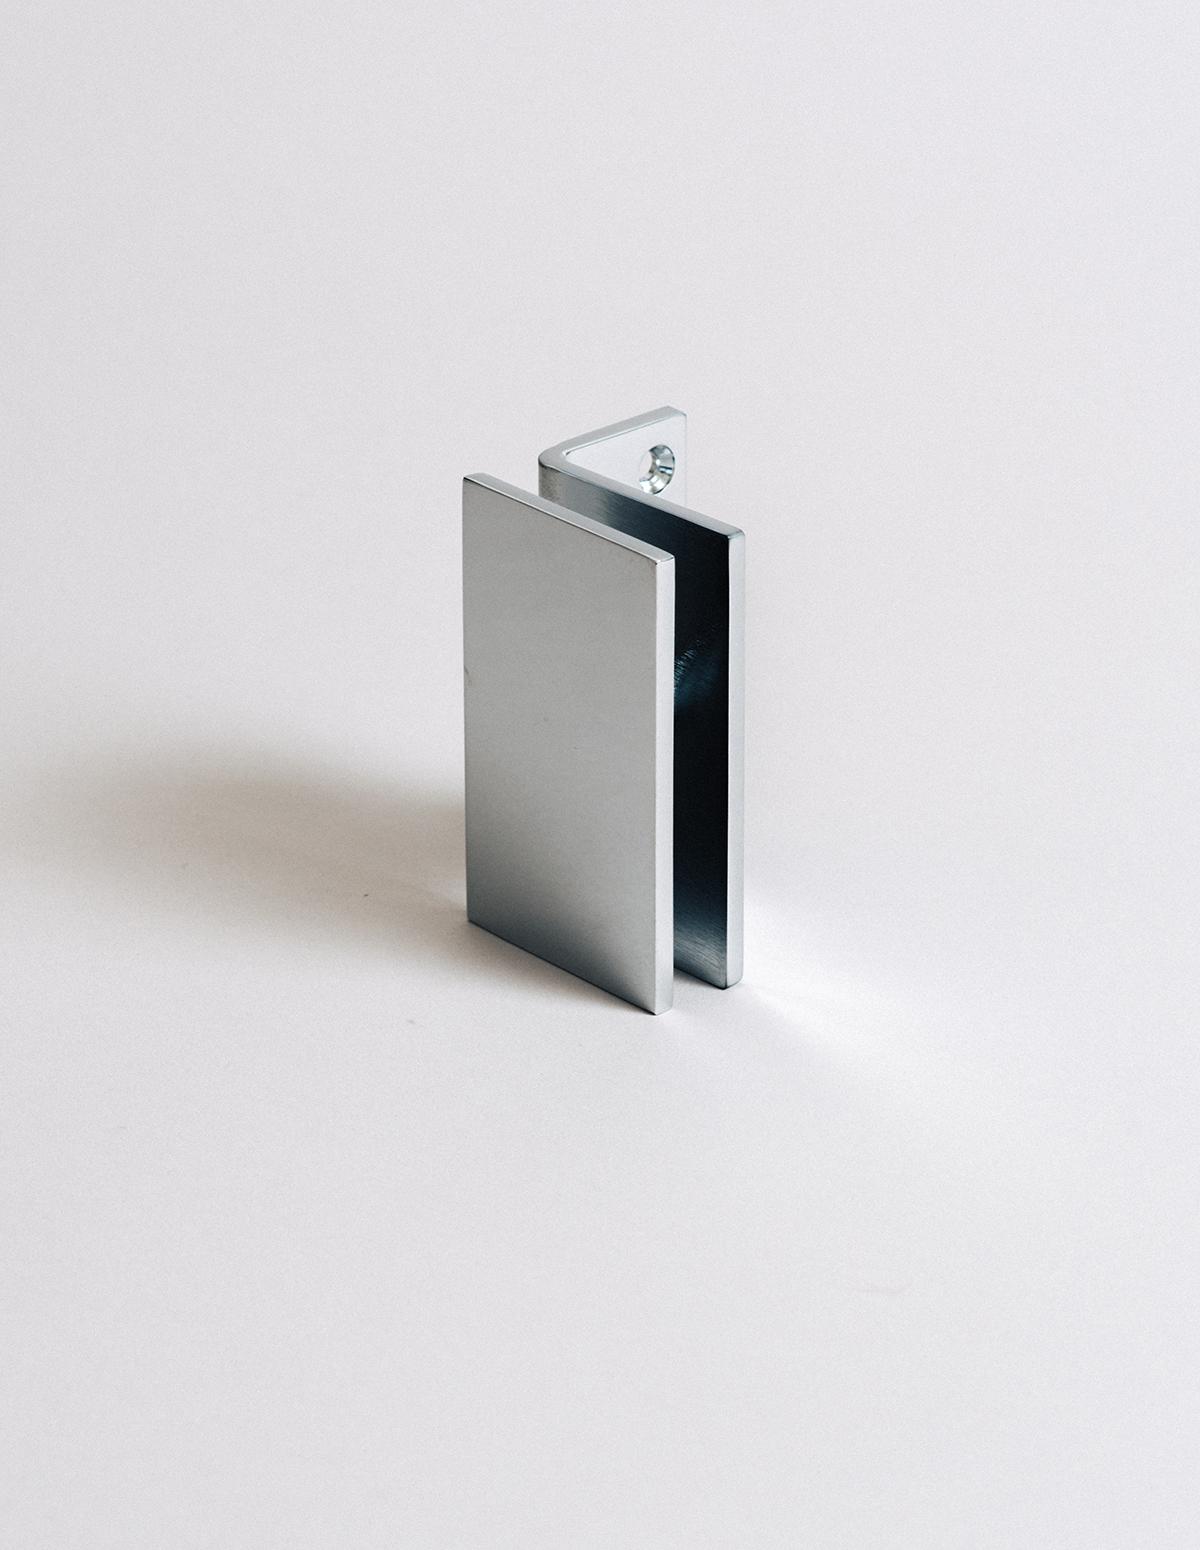 Optimum-Studios-Architectural-Glass-Metal-HardwarePage-GlassClip8-042216